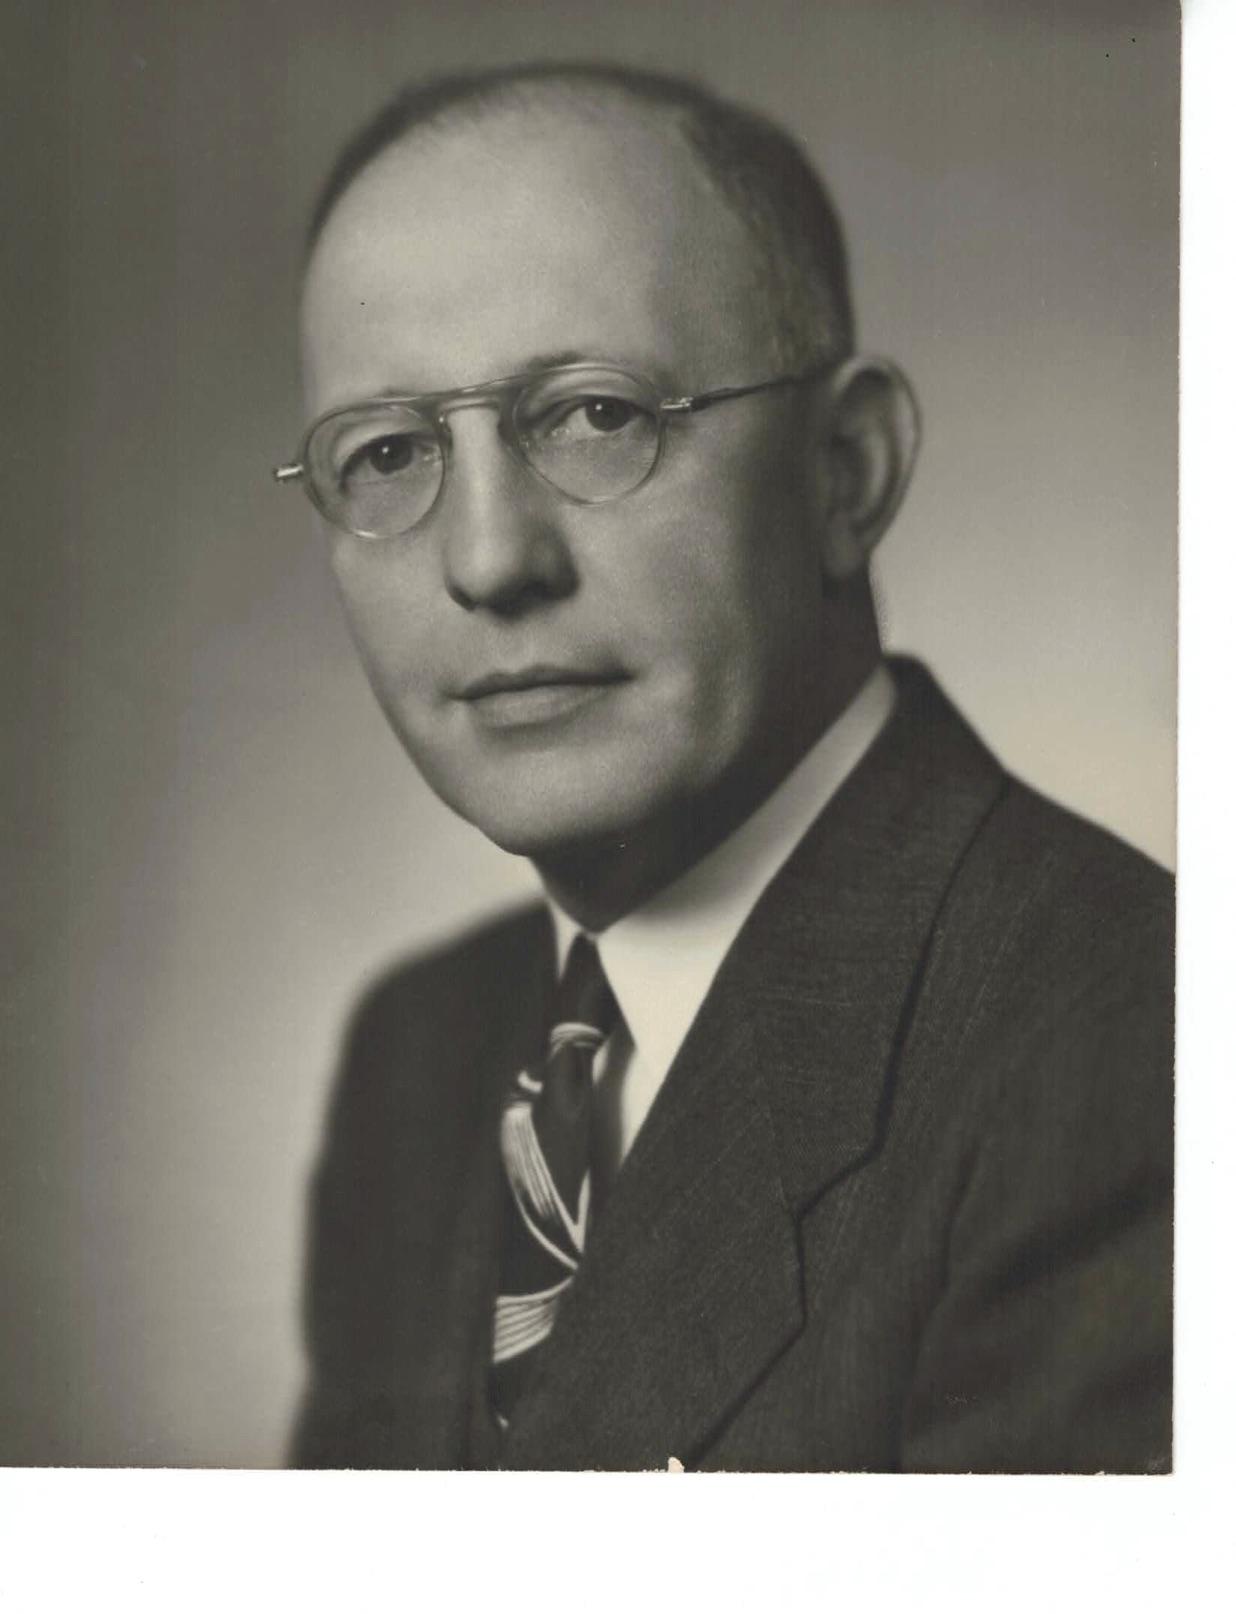 SCOTT K. CASSILL 1945-46